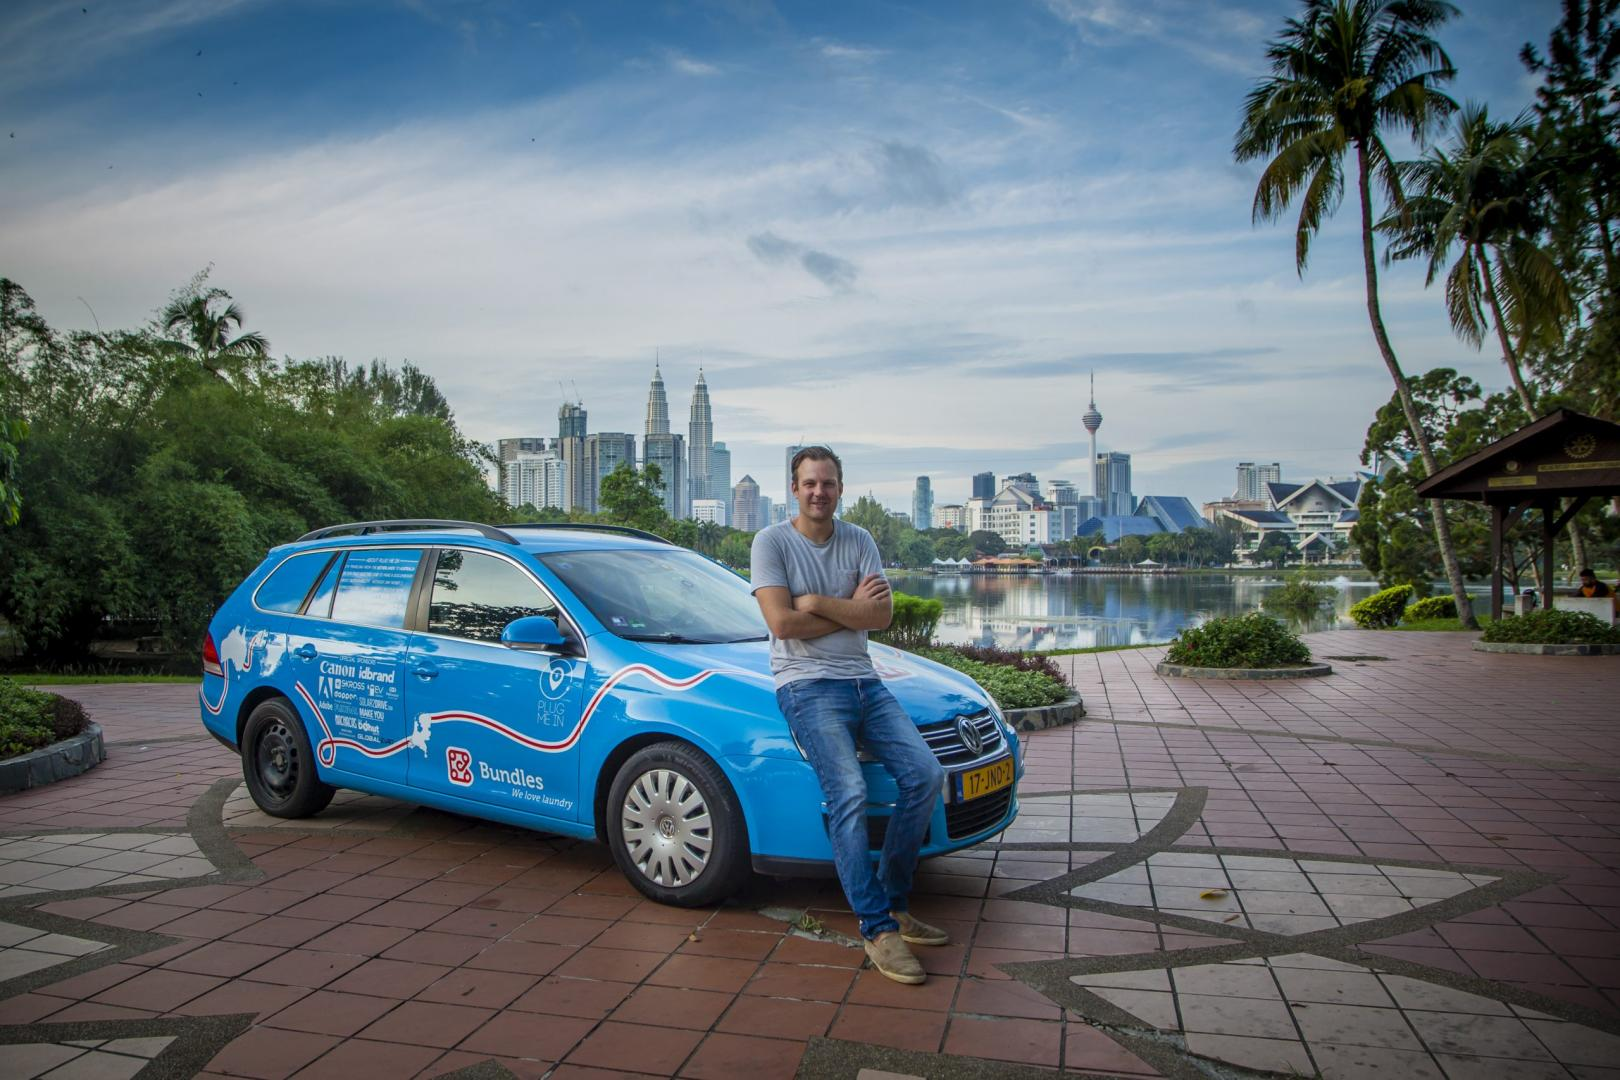 Elektrische Golf met Wiebe Wakker in Kuala Lumpur